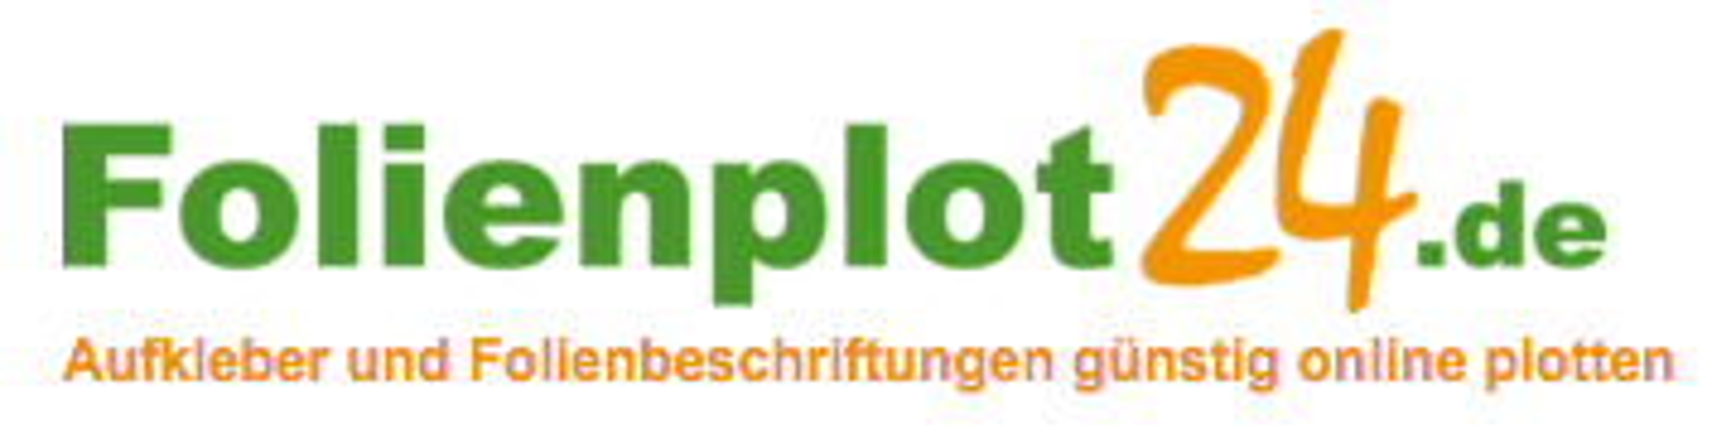 Folienplot24.de